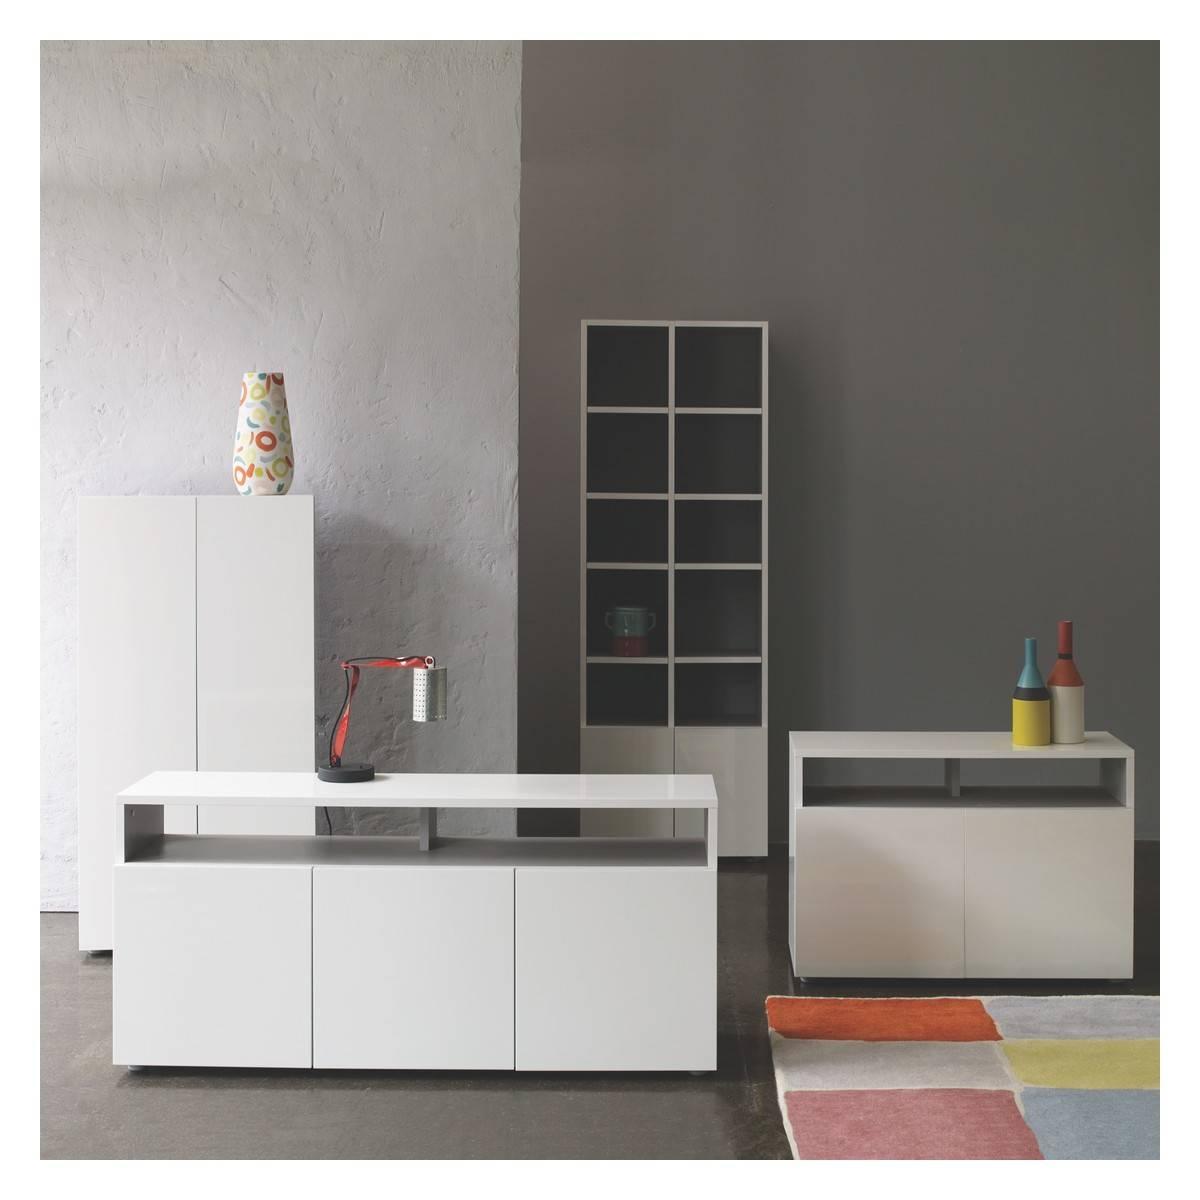 Kubrik White High Gloss Tall Shelving Unit | Buy Now At Habitat Uk Regarding Recent High Gloss Grey Sideboards (View 6 of 15)